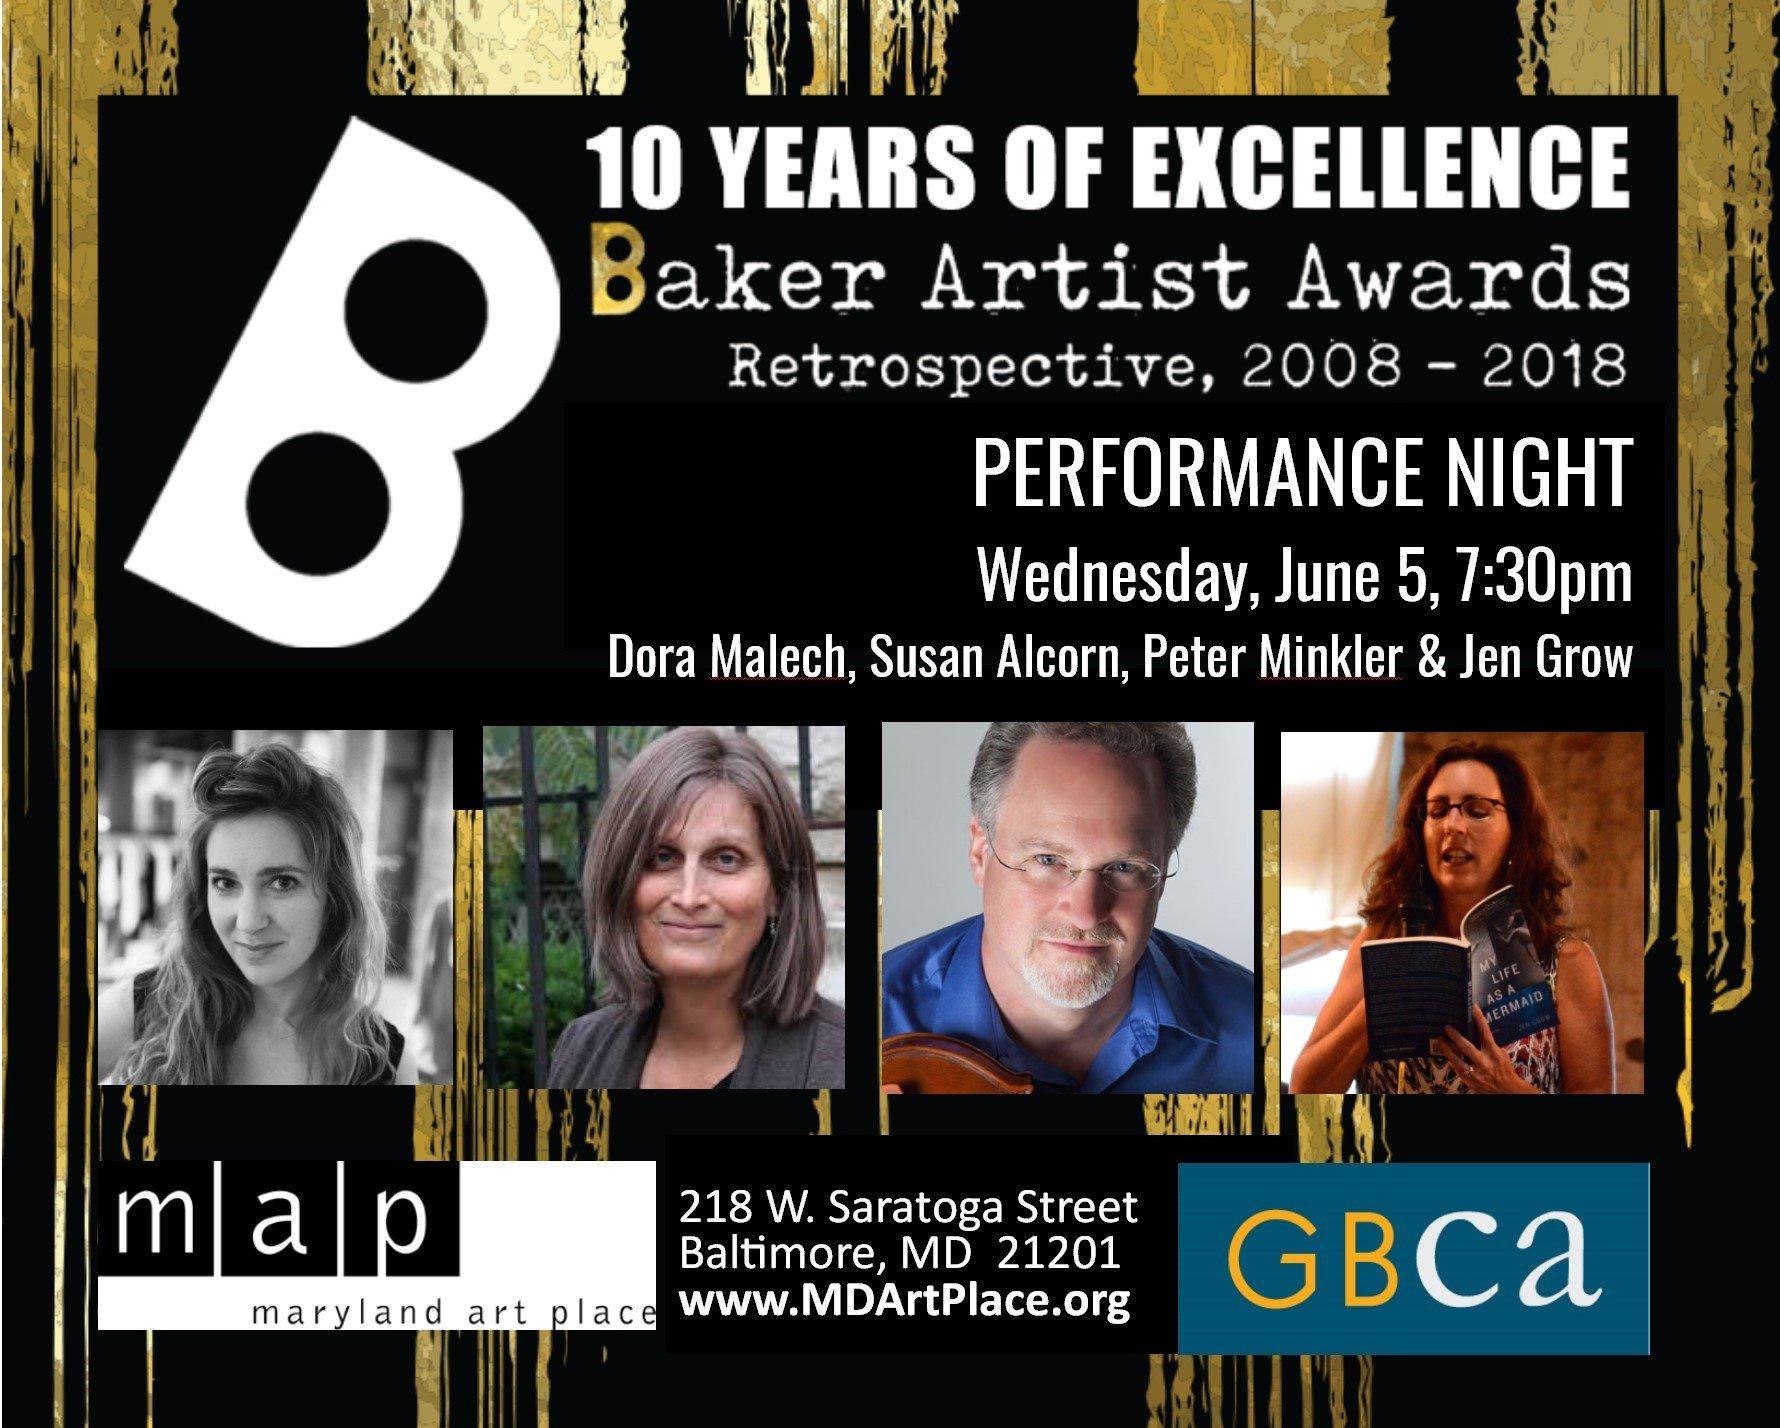 Baker Artists Award Retrospective 2008-2018